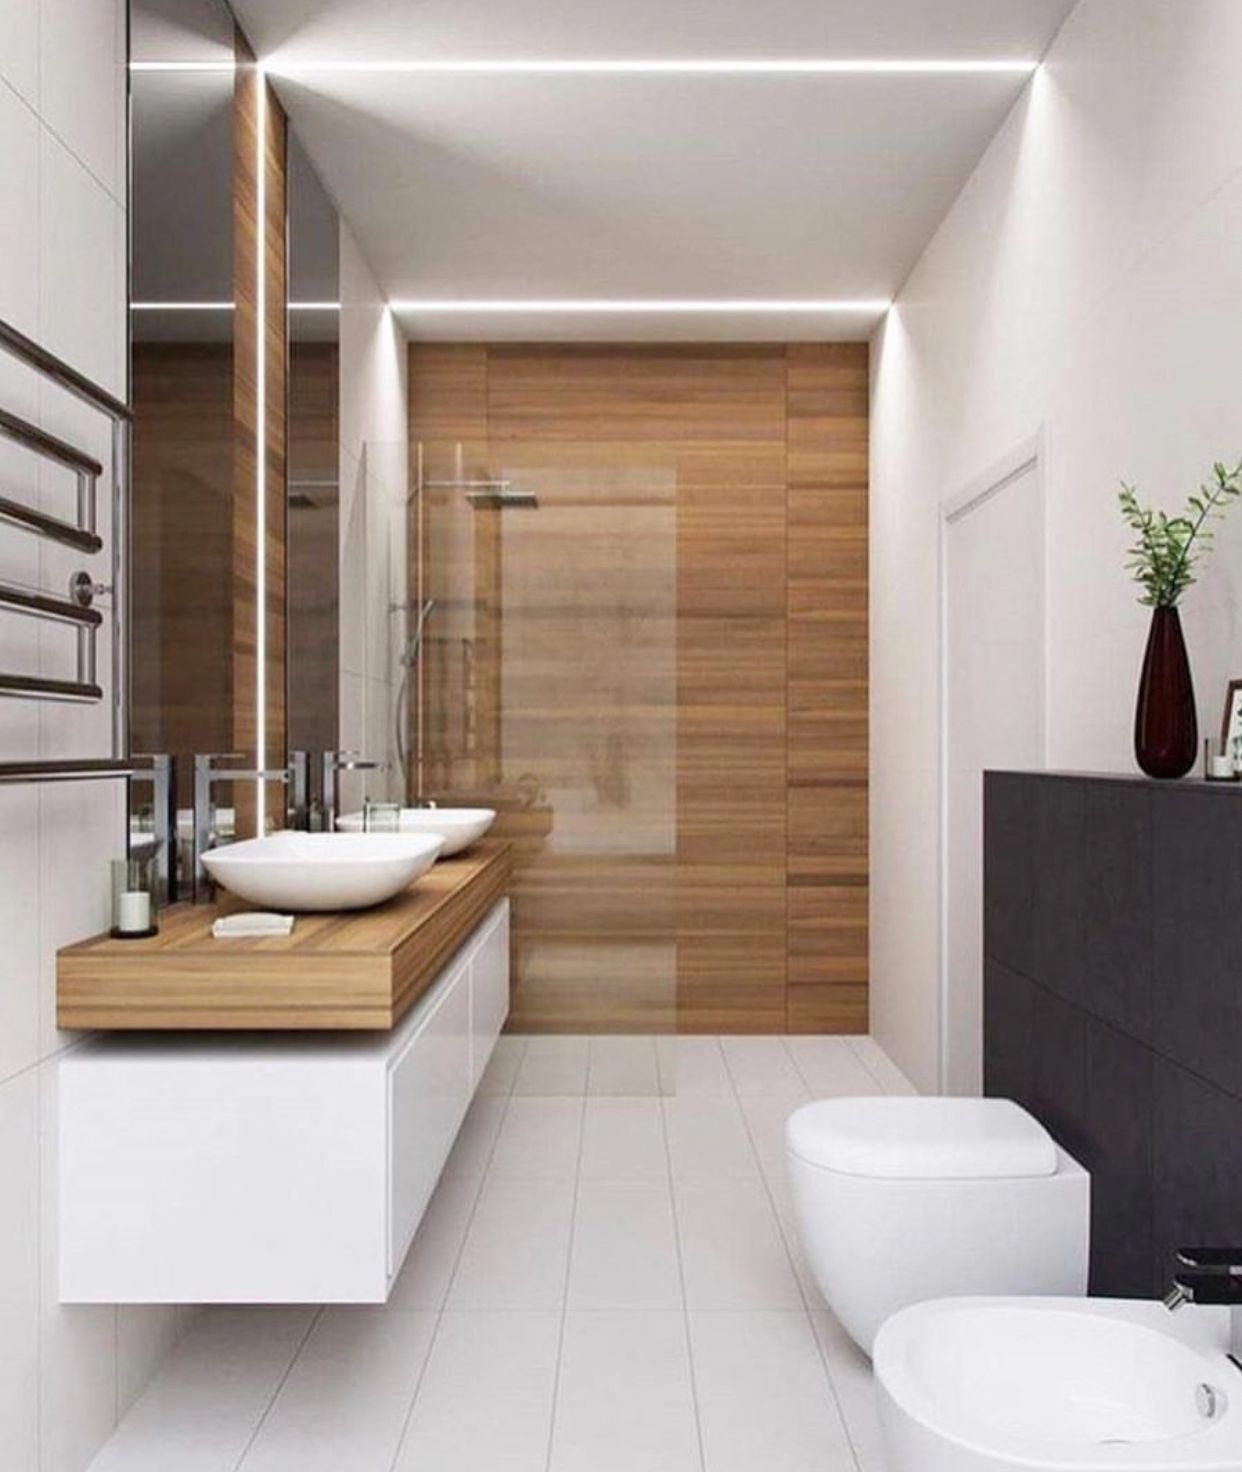 27 Best Small Bathroom Design Ideas That Will Make It Stand Out Smallbathroomideas Small Bathroom Remodel Beautiful Bathroom Designs Master Bathroom Design